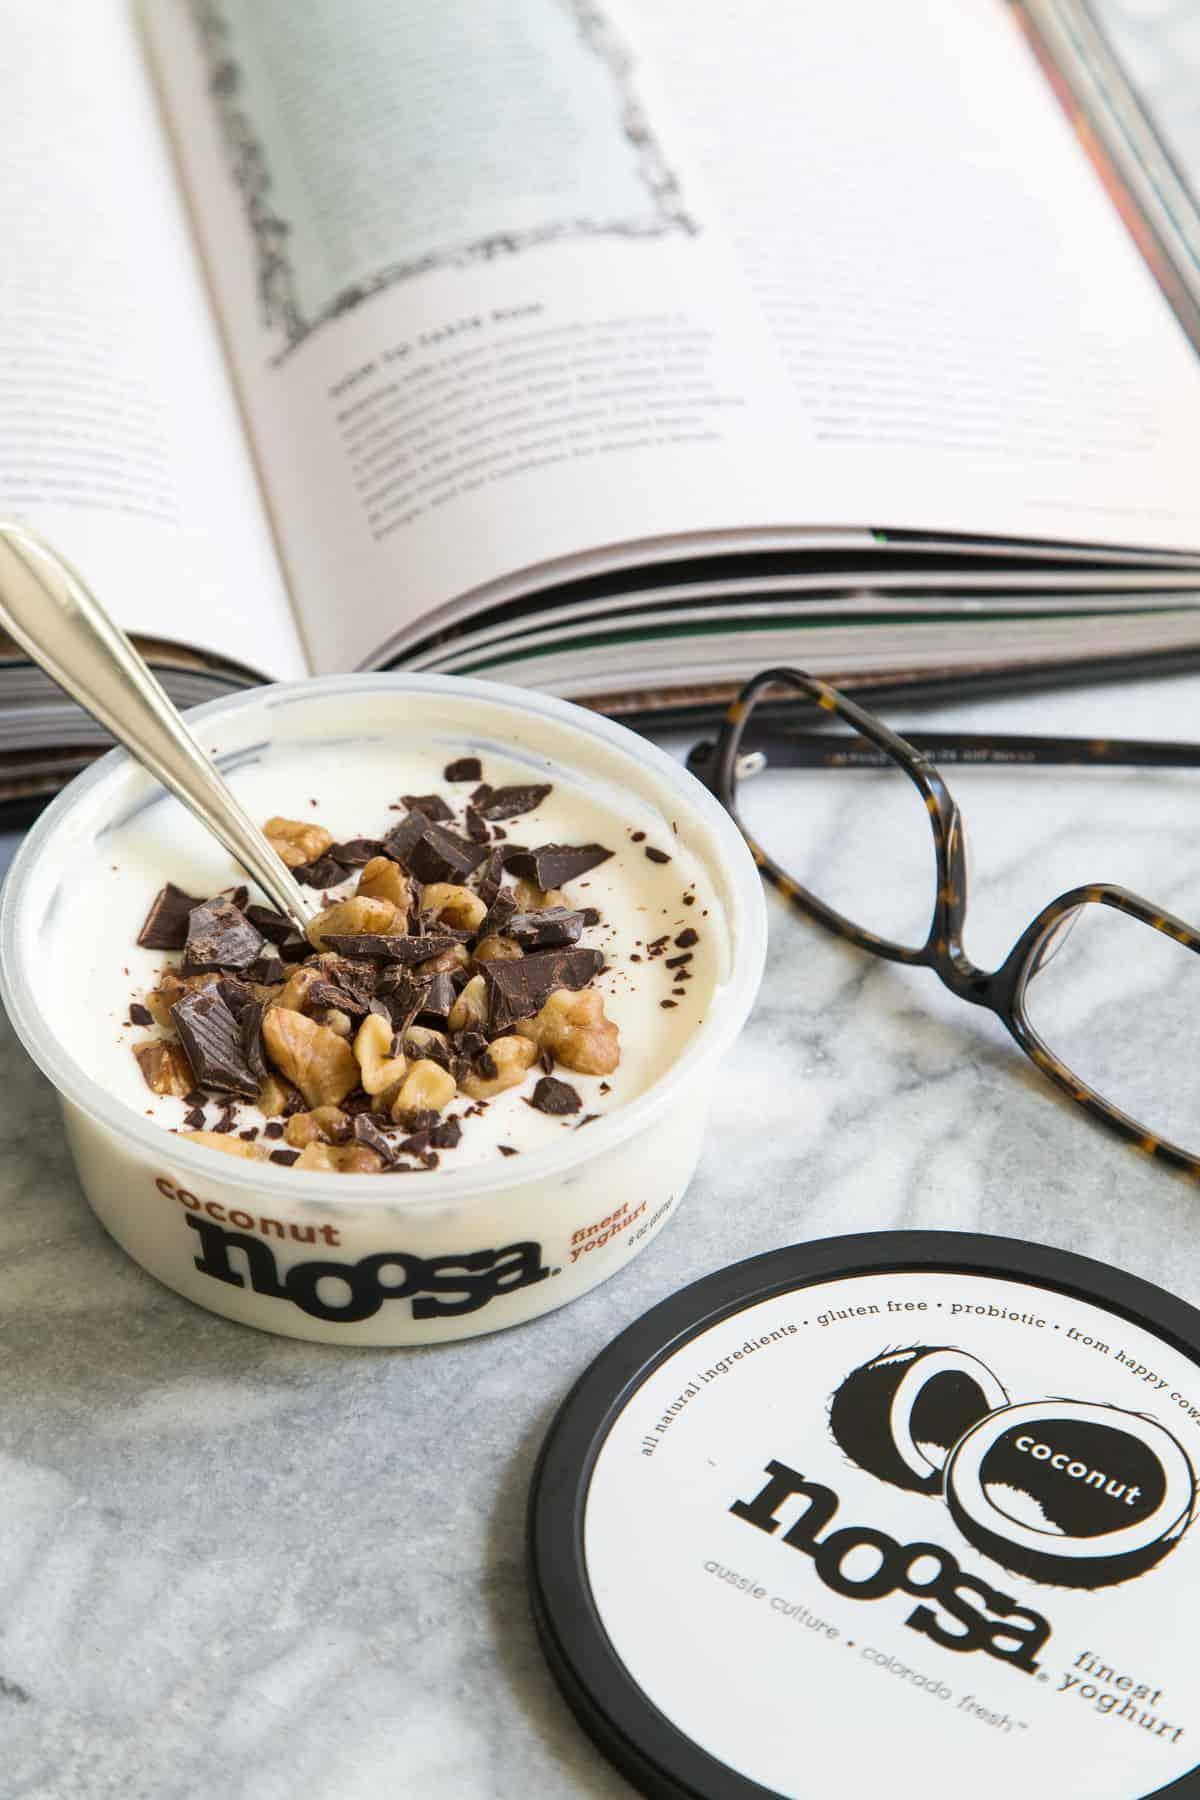 Noosa Yoghurt Dessert